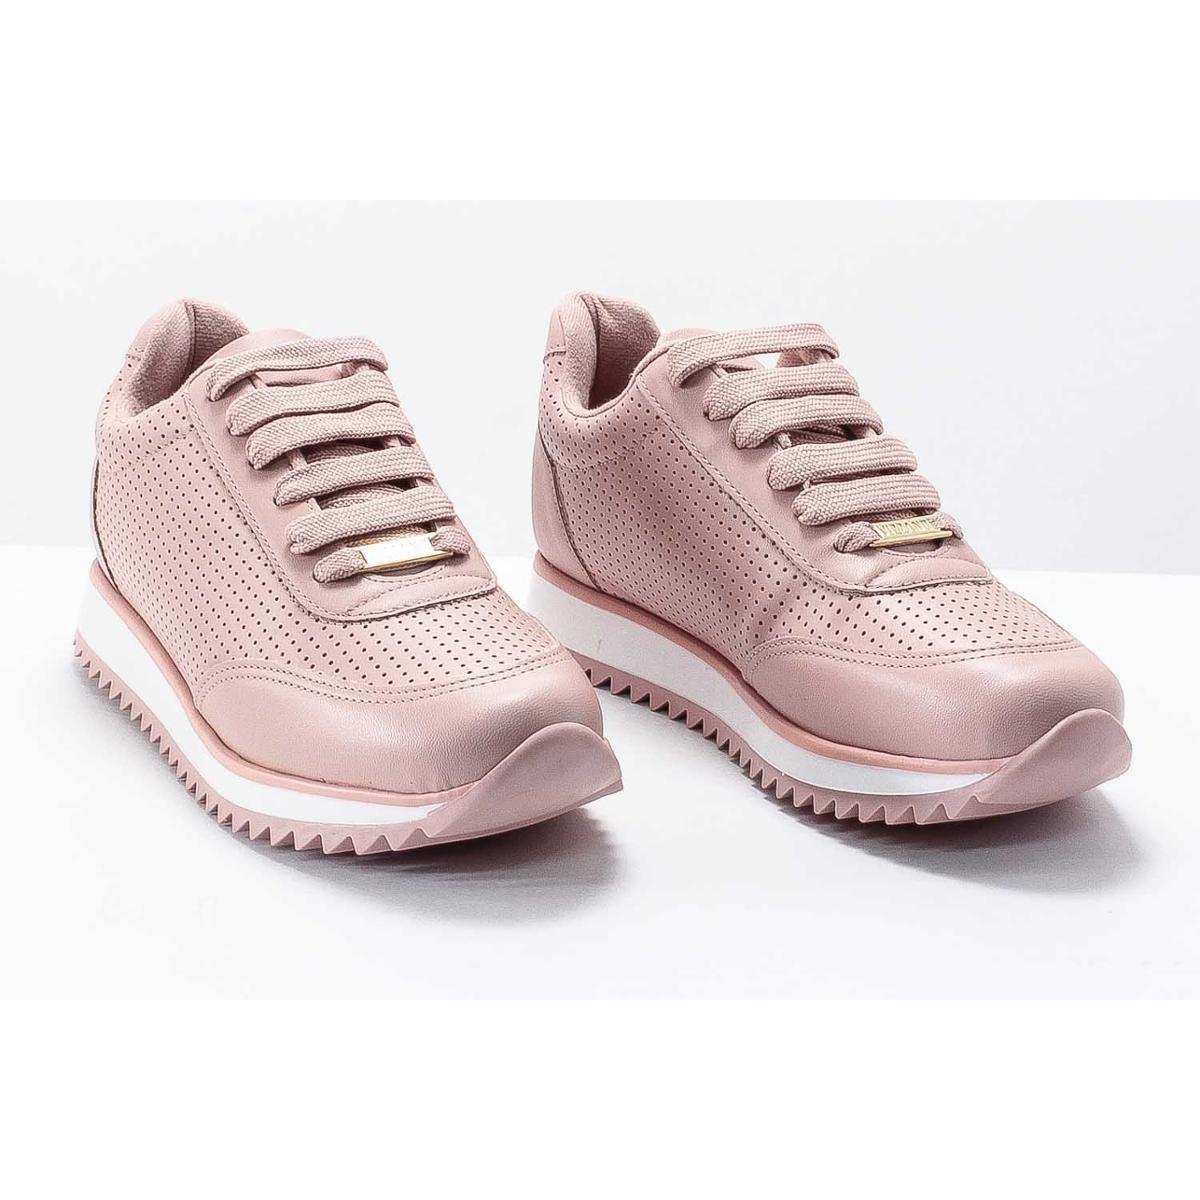 3e69a6c582 Tênis vizzano tratorado pelica feminino rosa compre agora zattini jpg  544x544 Tenis vizzano tratorado rosa